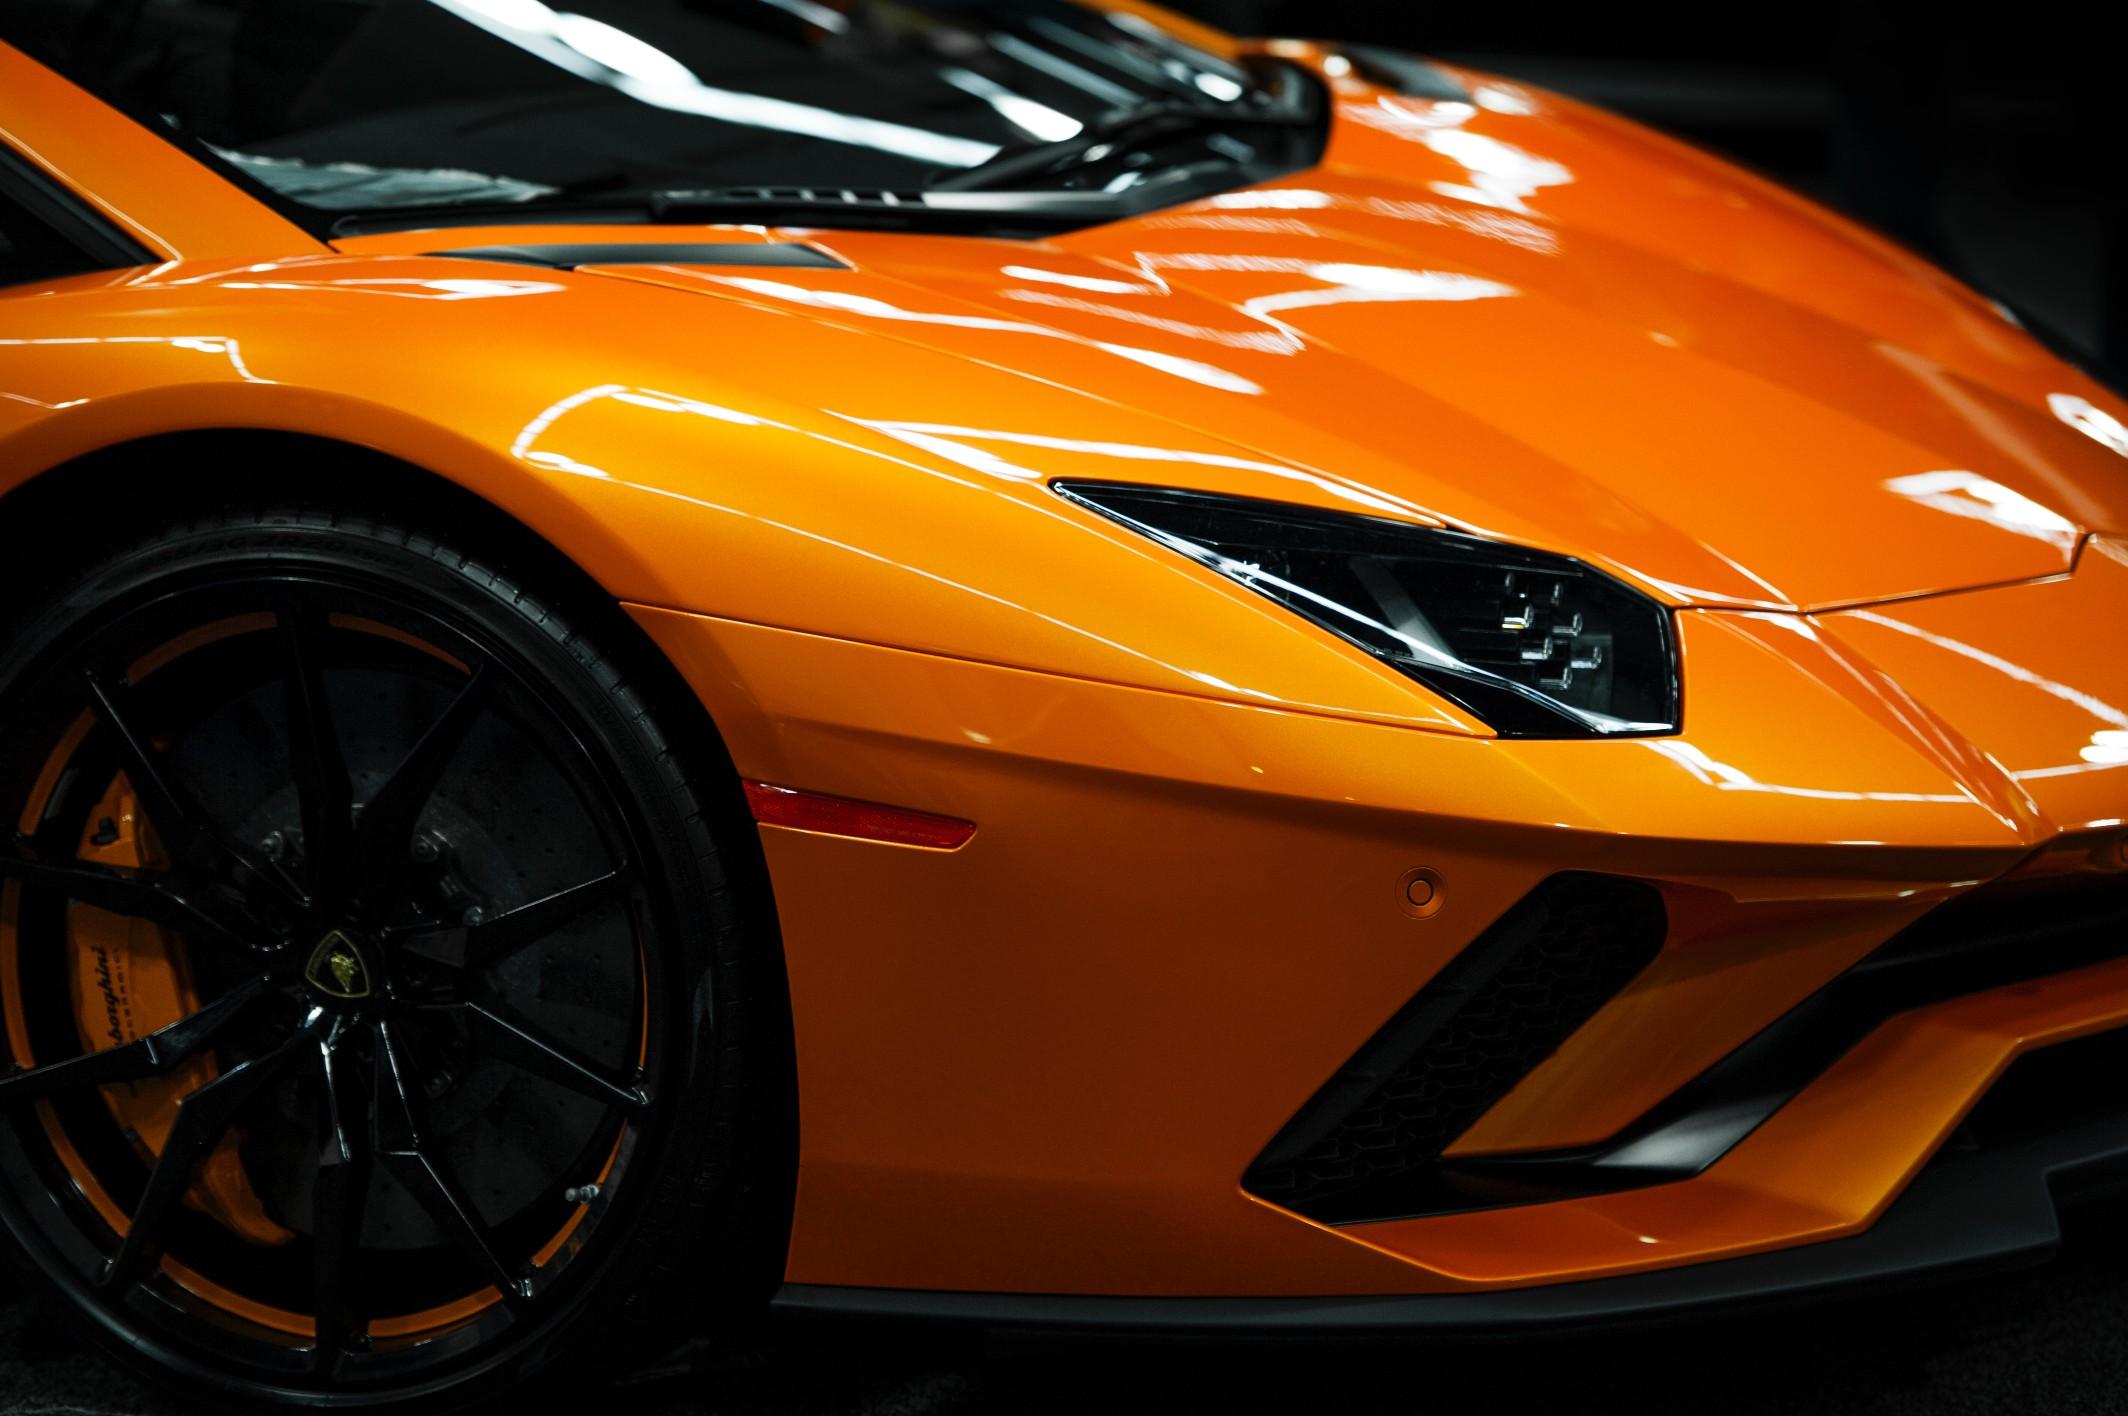 Front of Lamborghini aventador